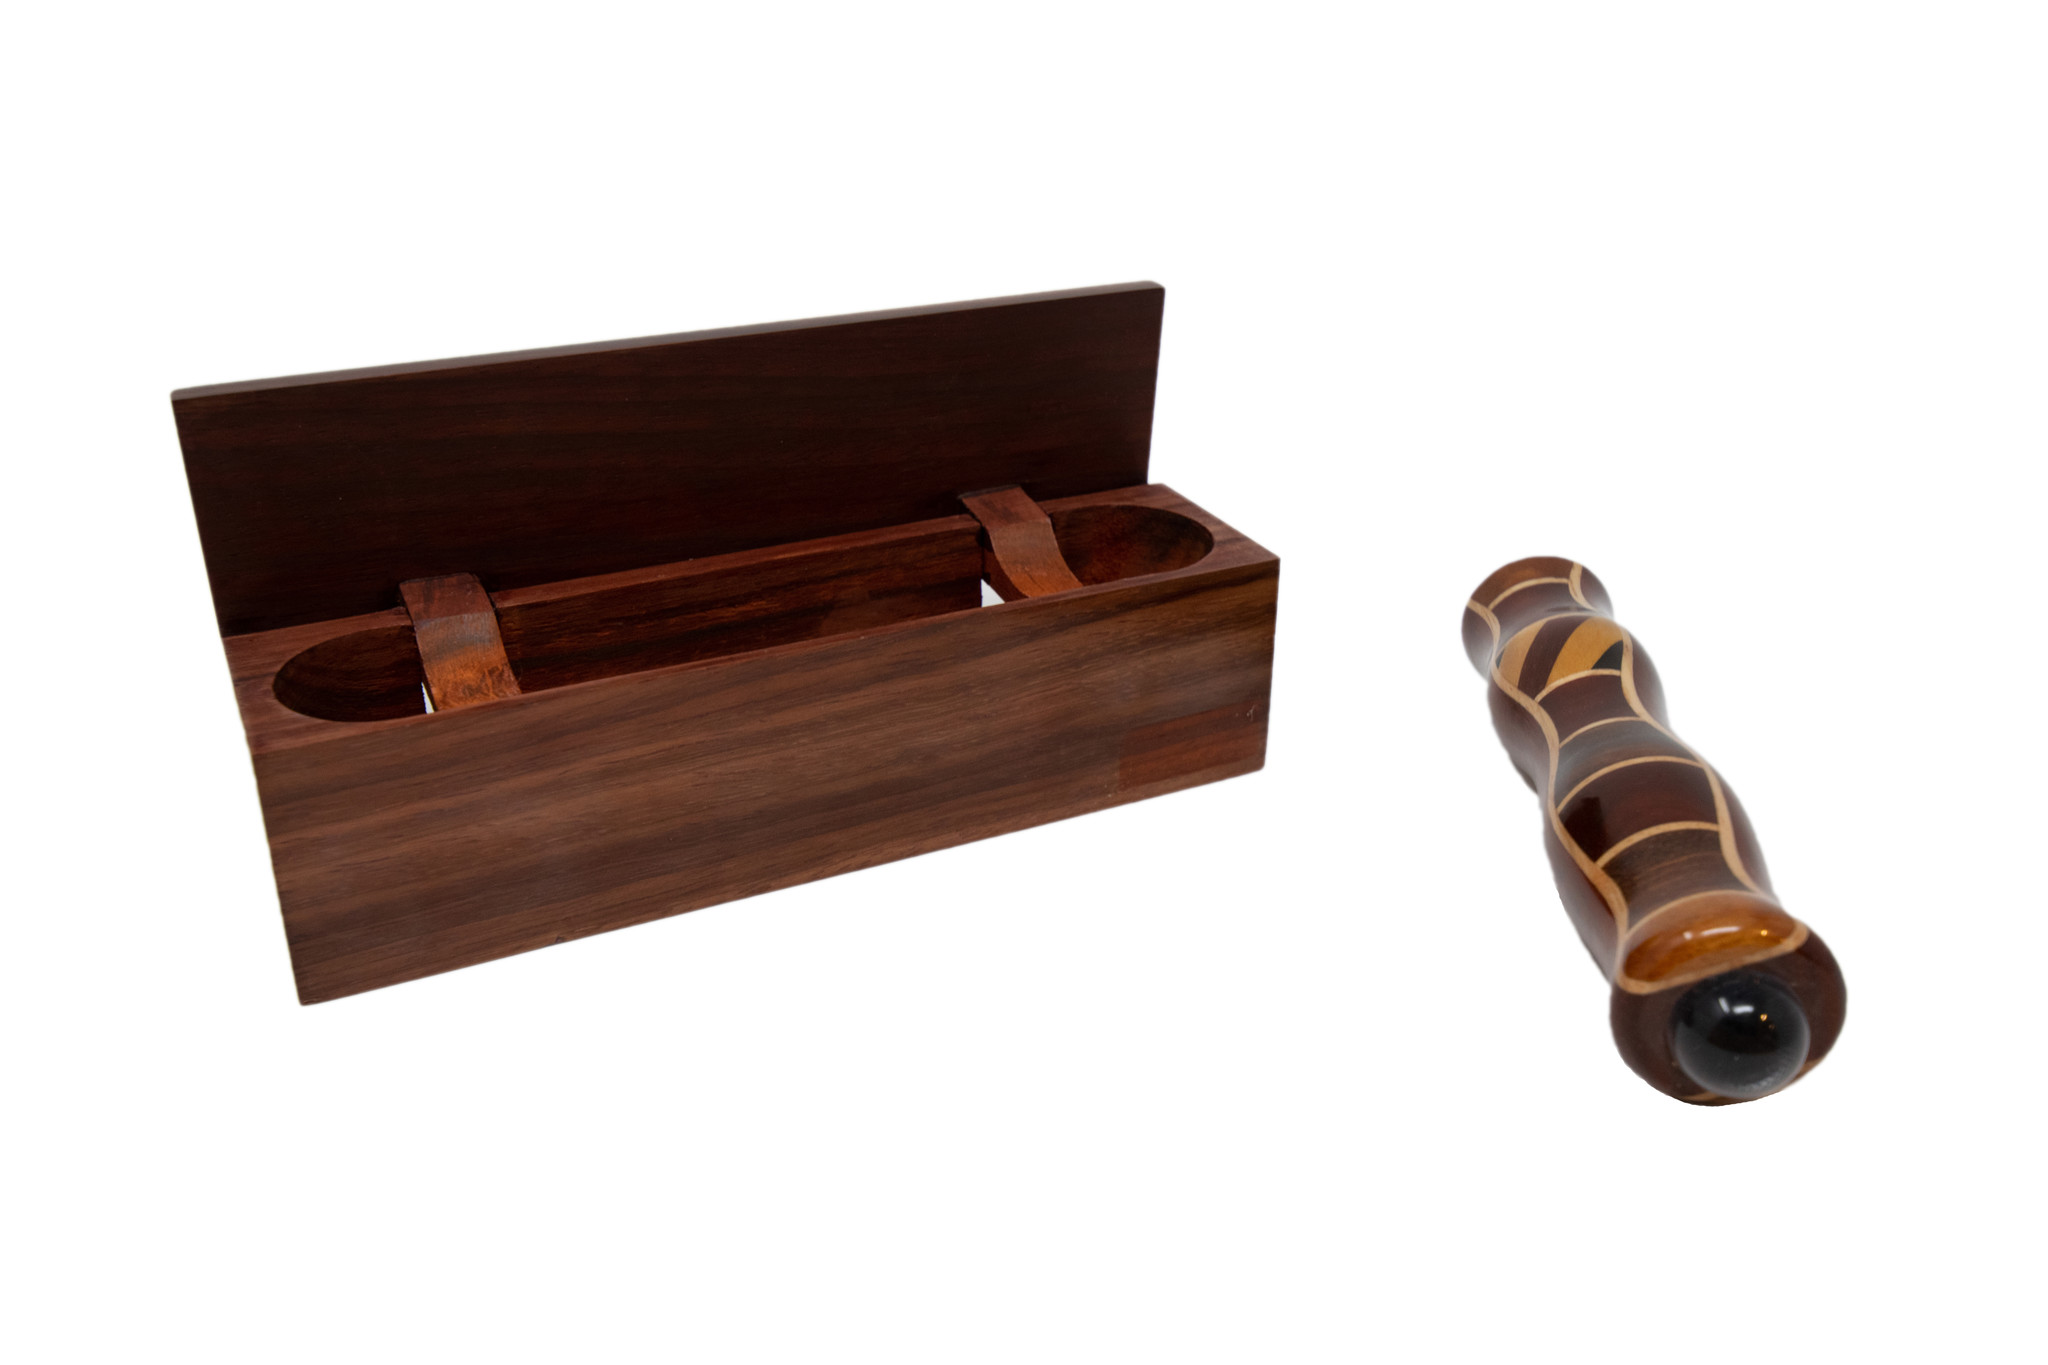 Wood Box Lift Up Paduak w/5.5Tscope-1